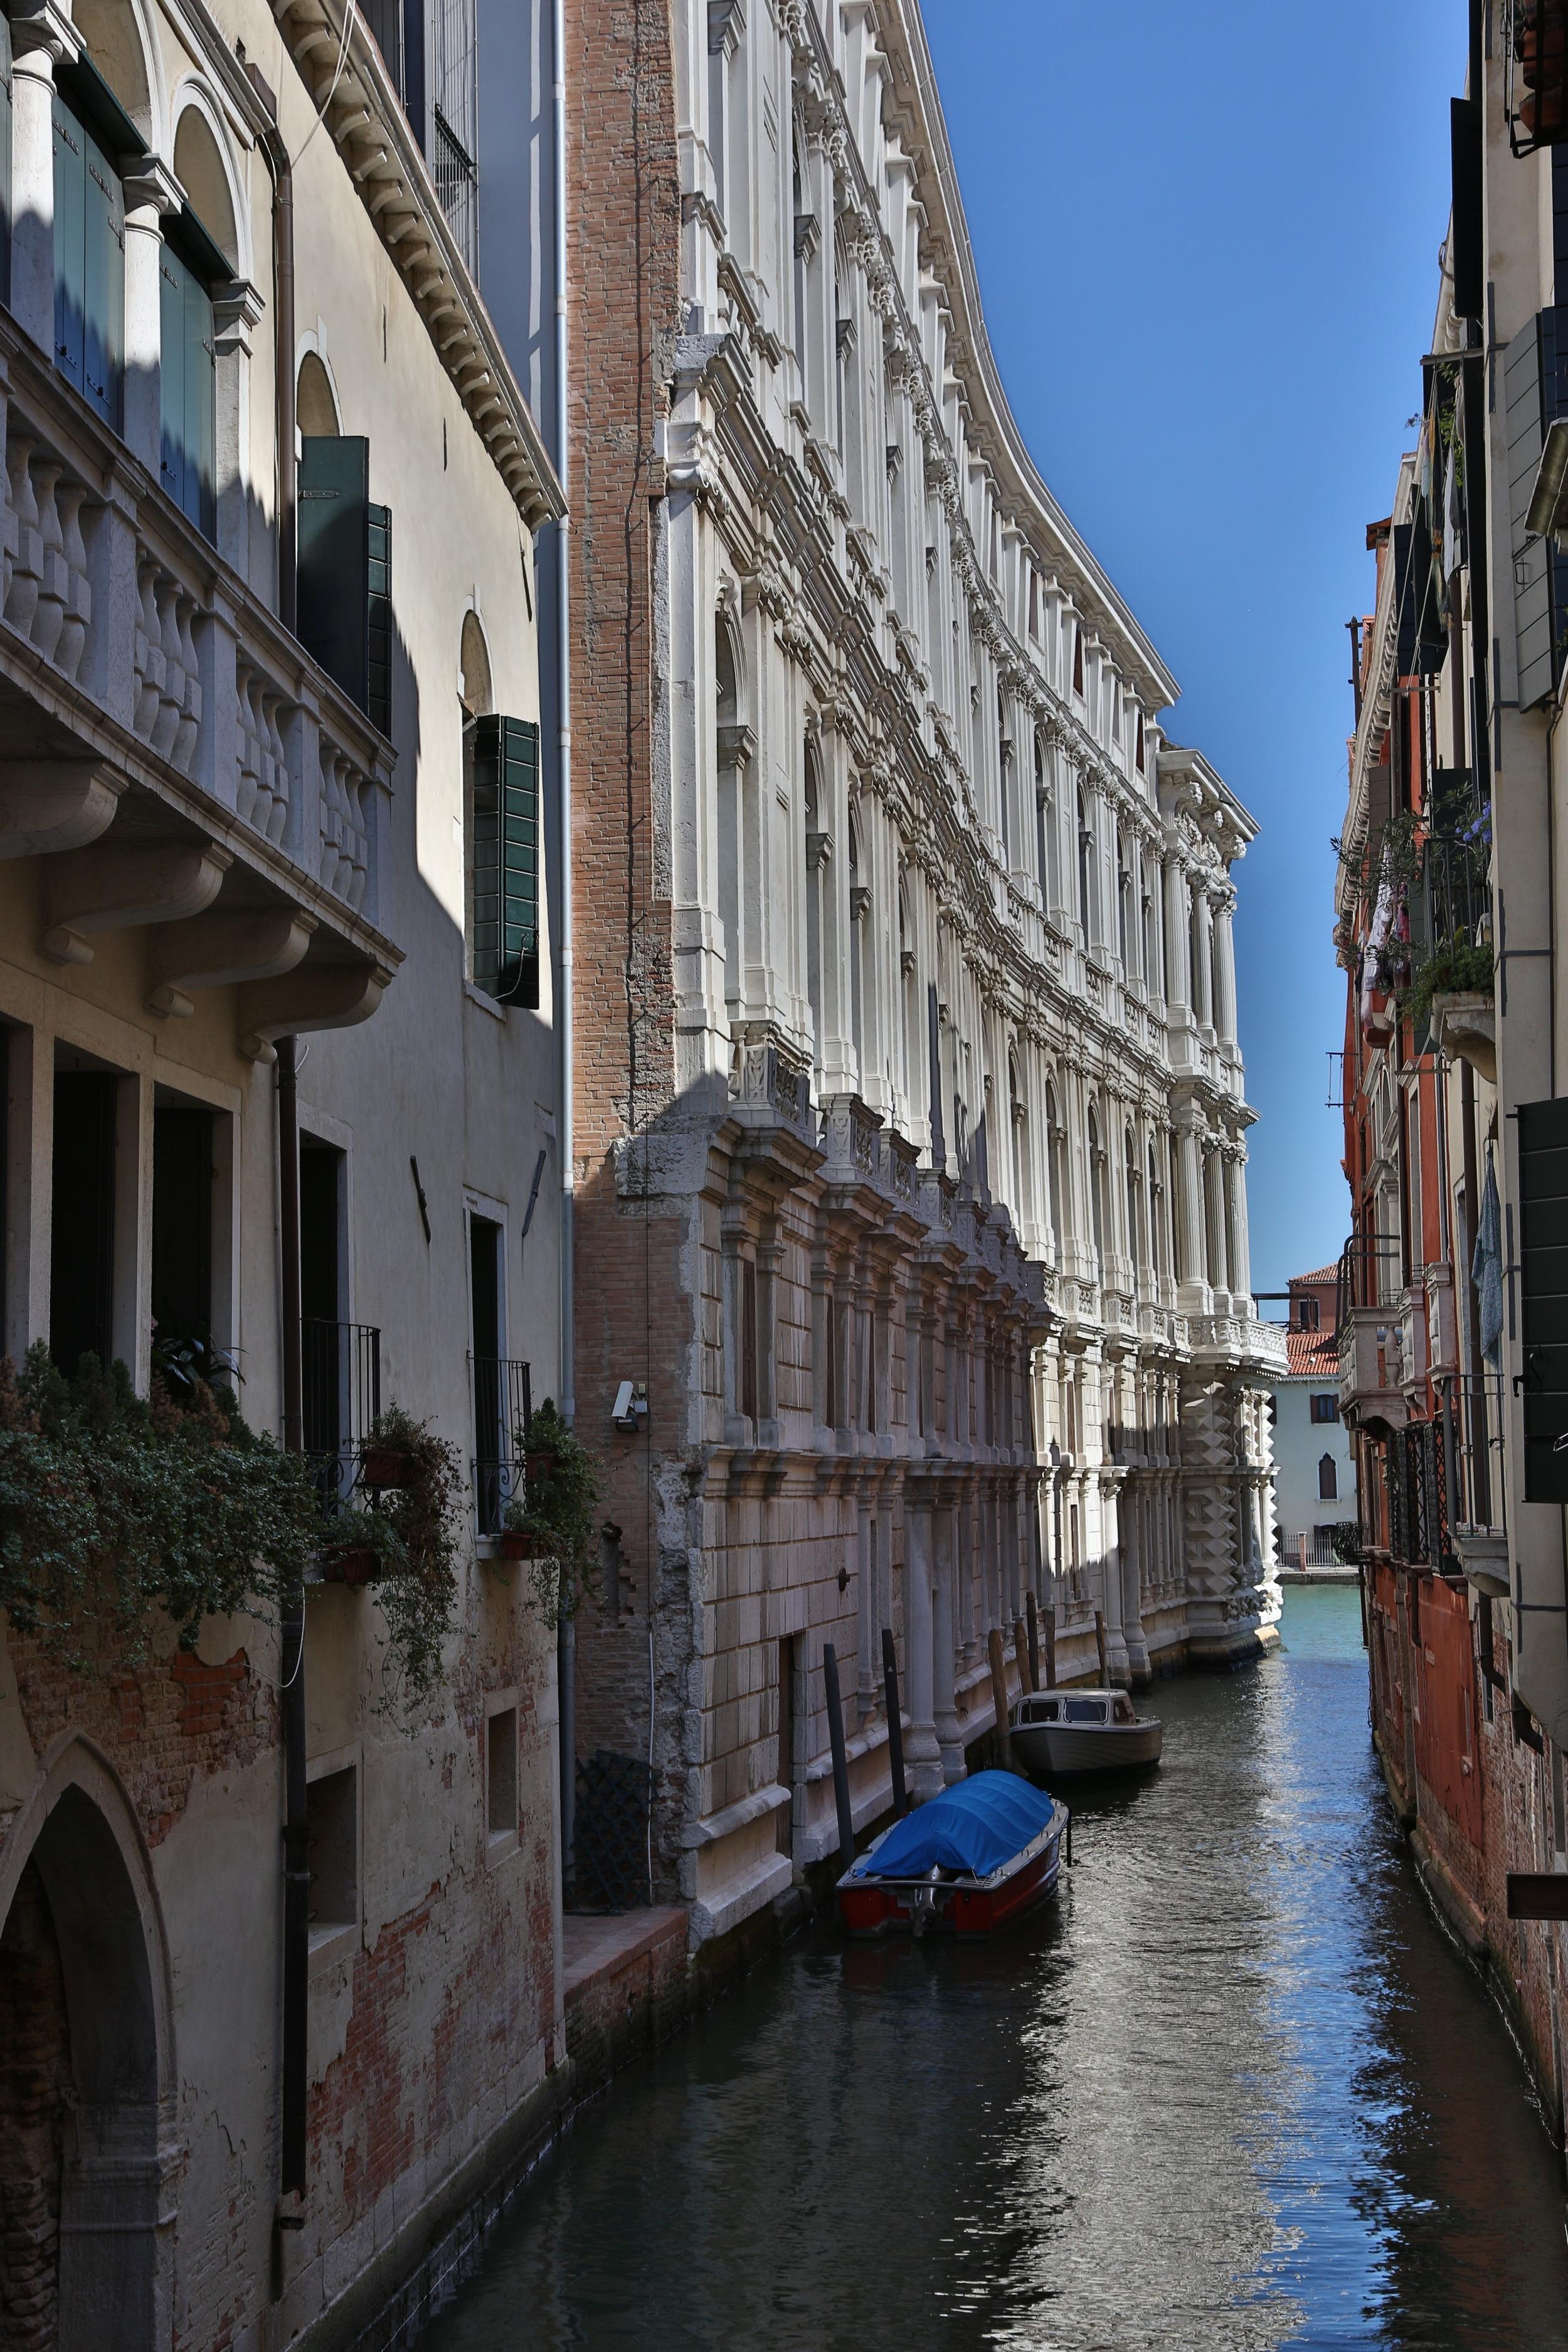 1209_Venise_0888.JPG